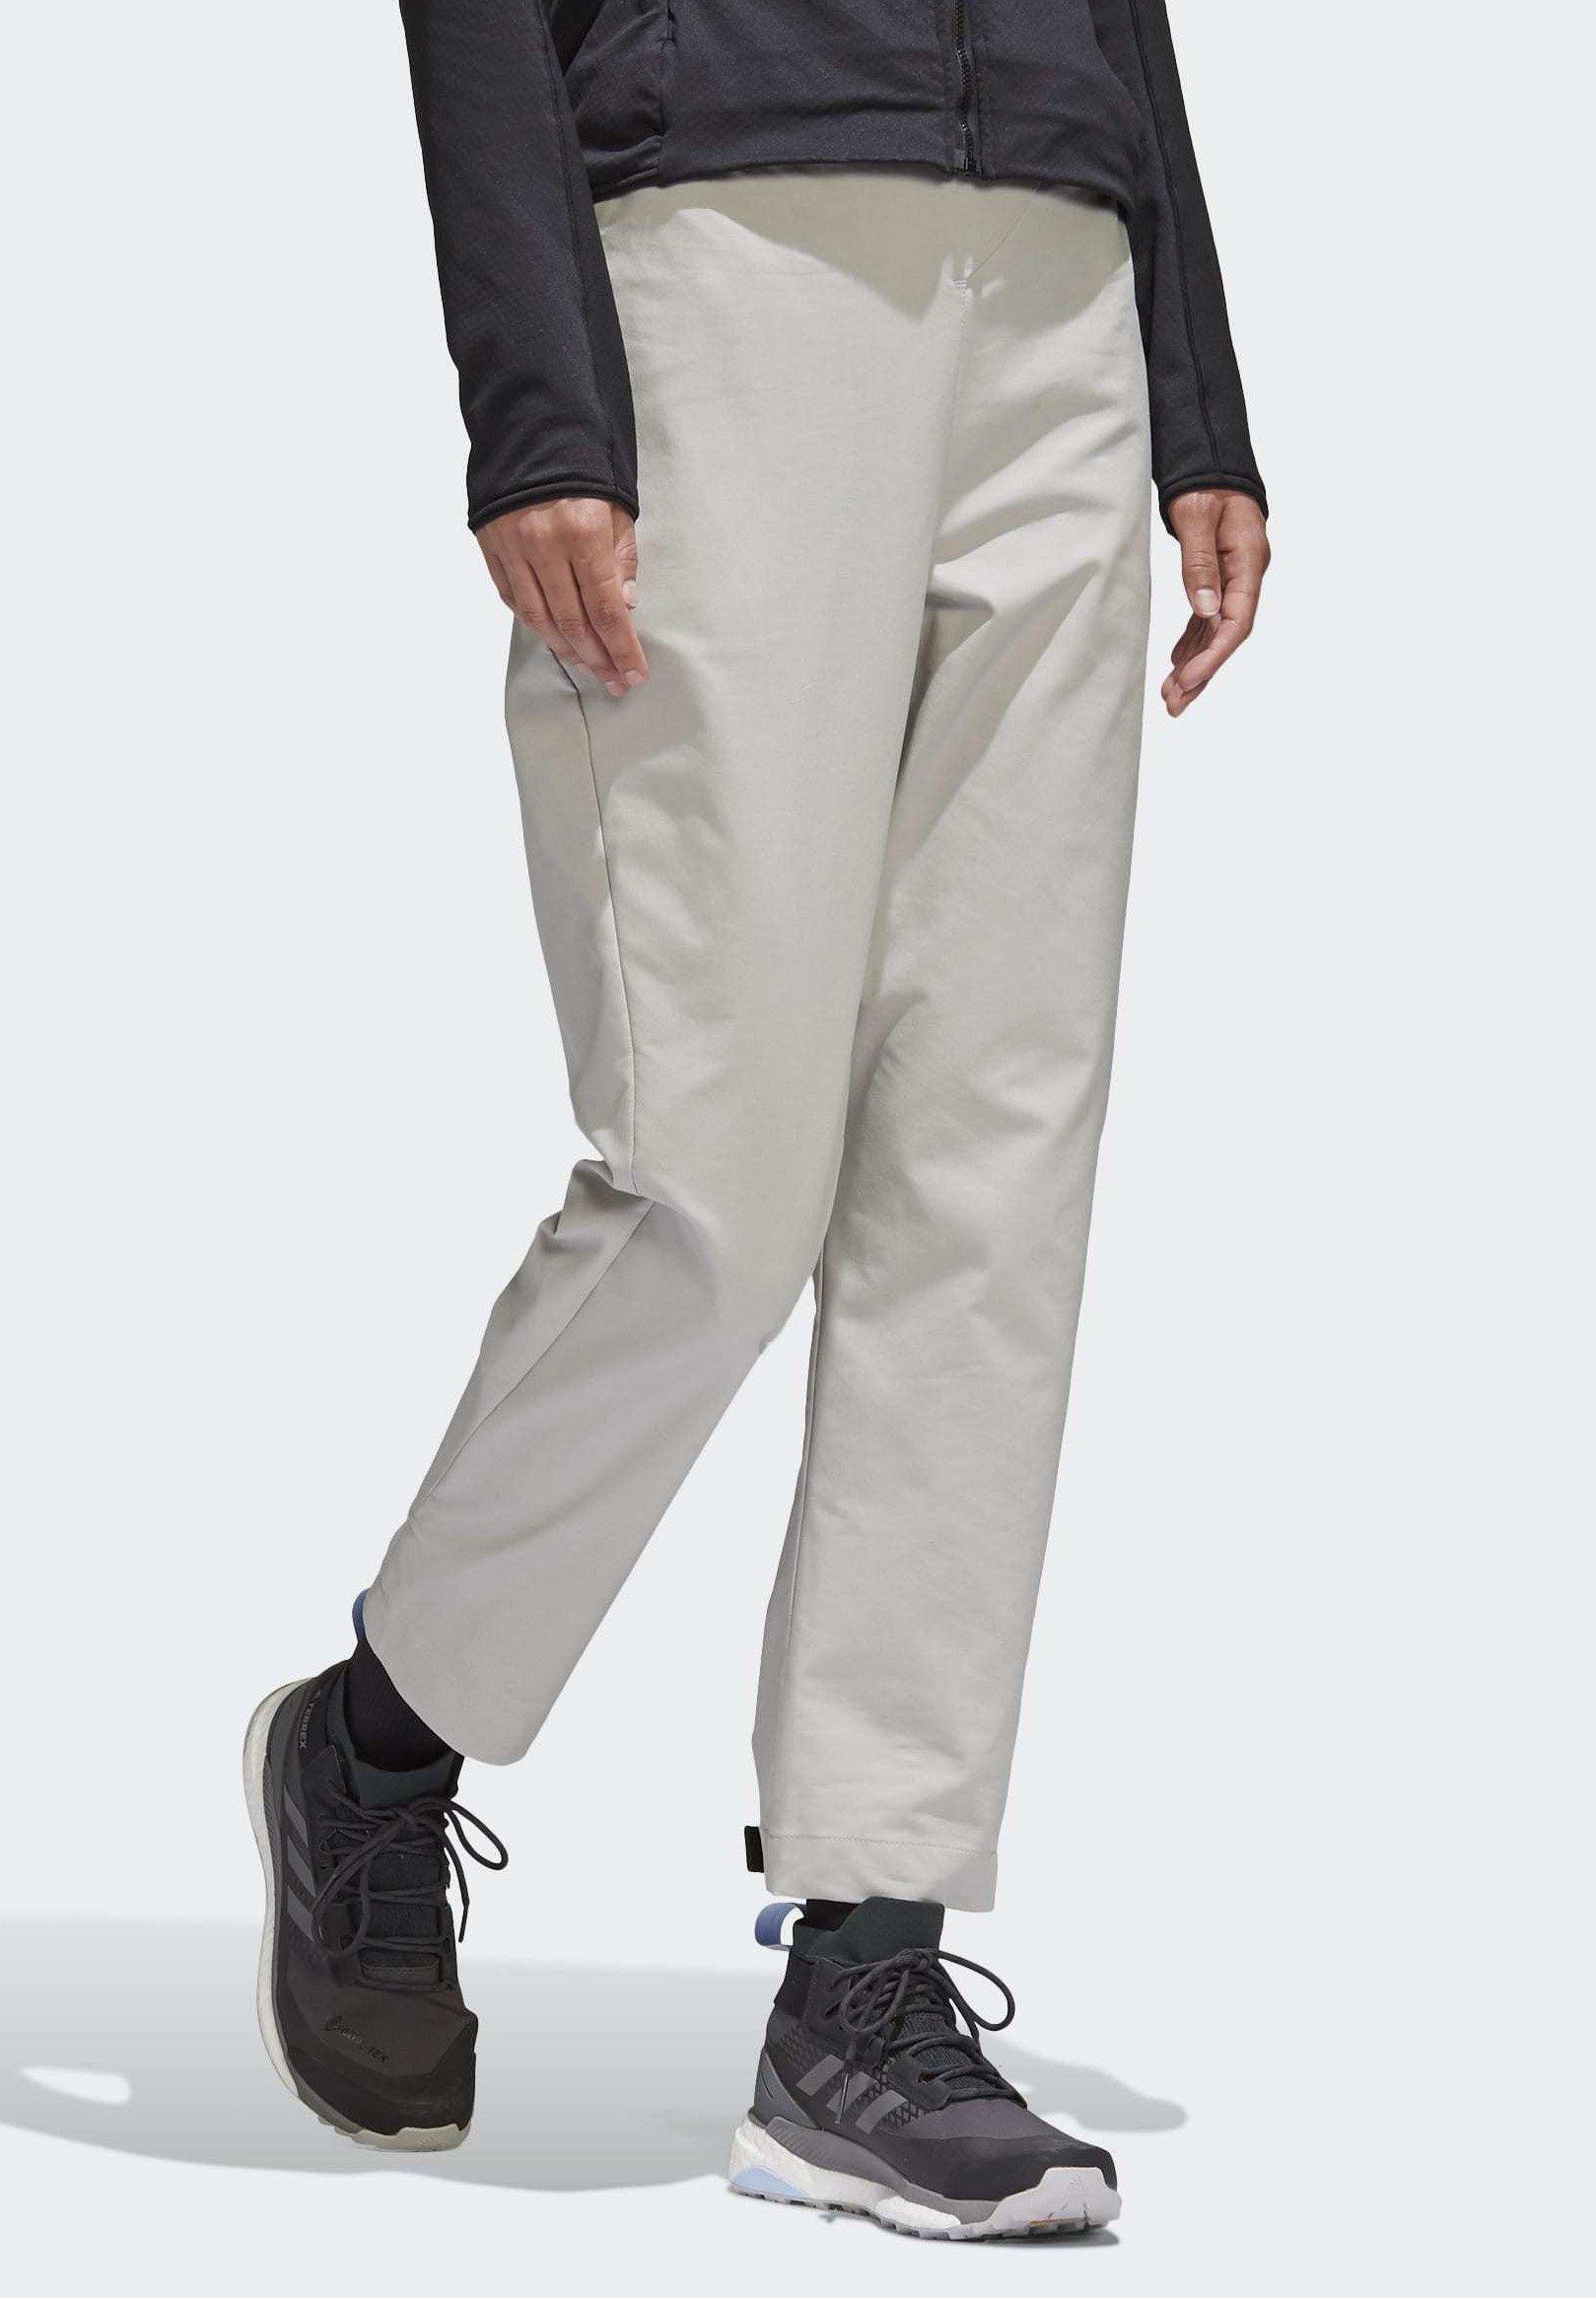 adidas Performance Trousers - grey 3zXTm